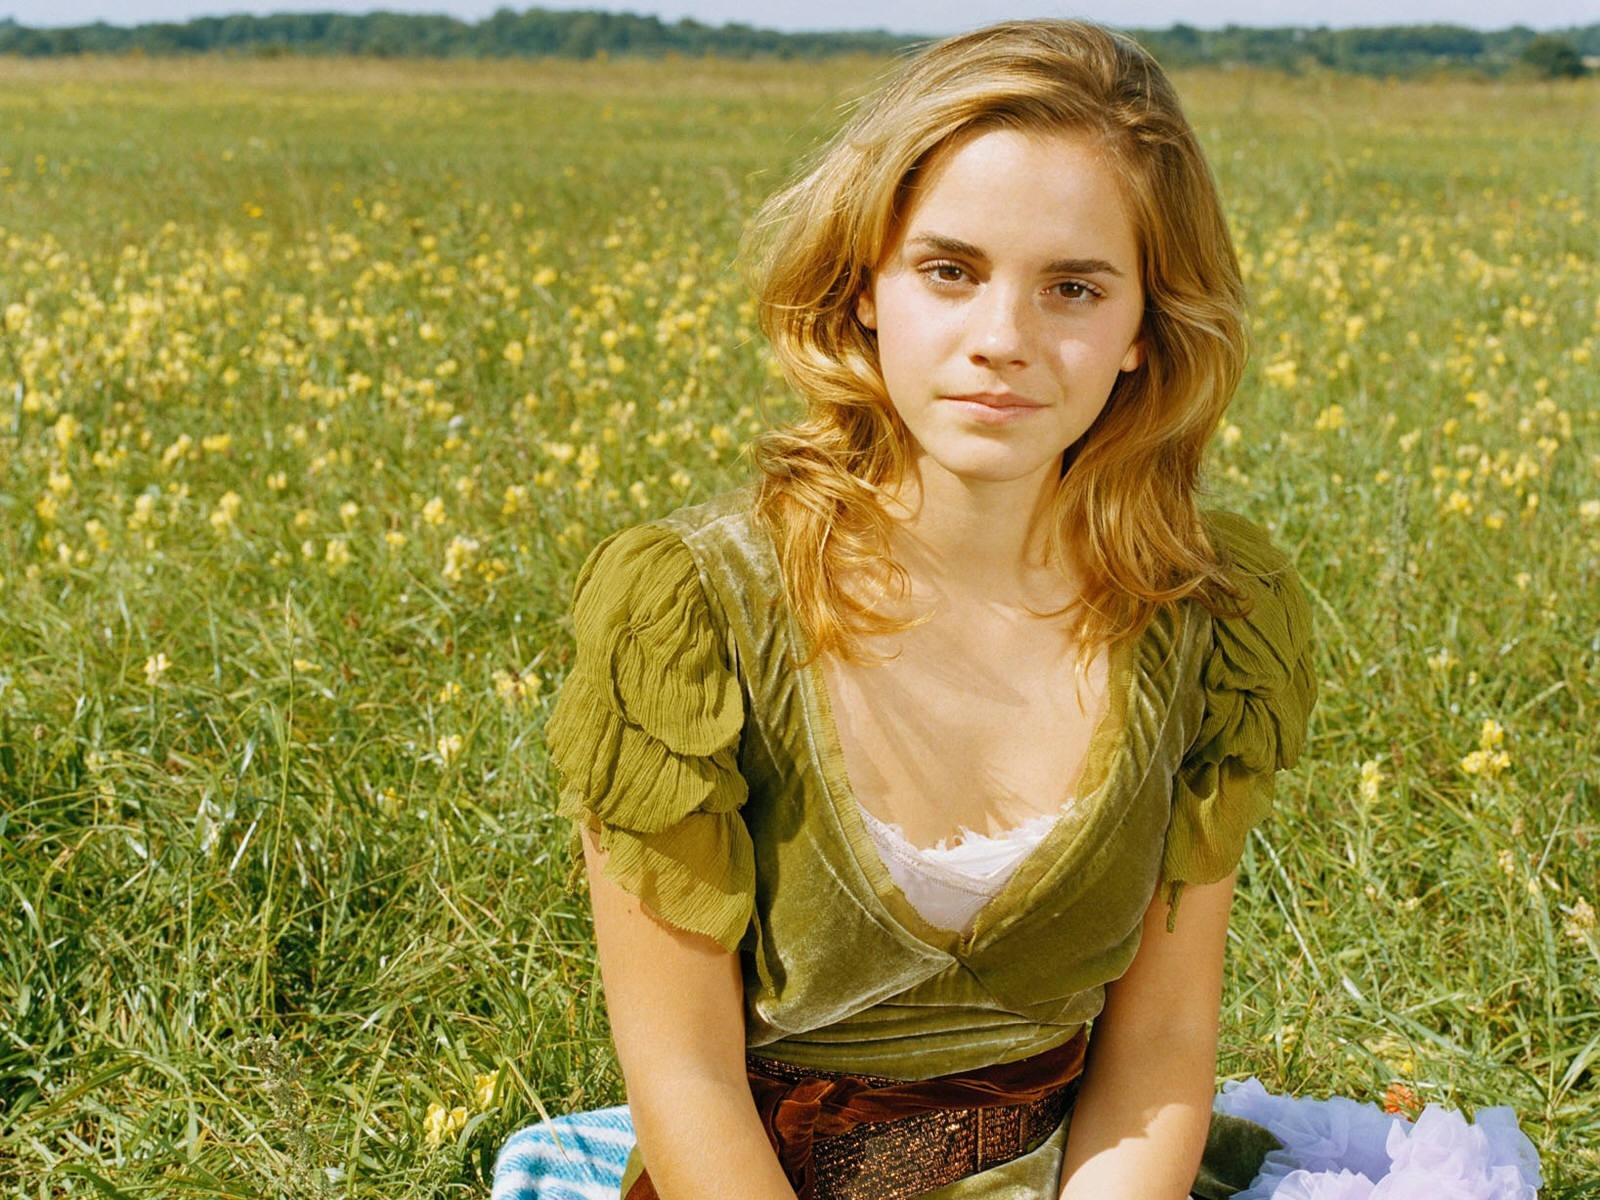 Wallpaper di Emma Watson